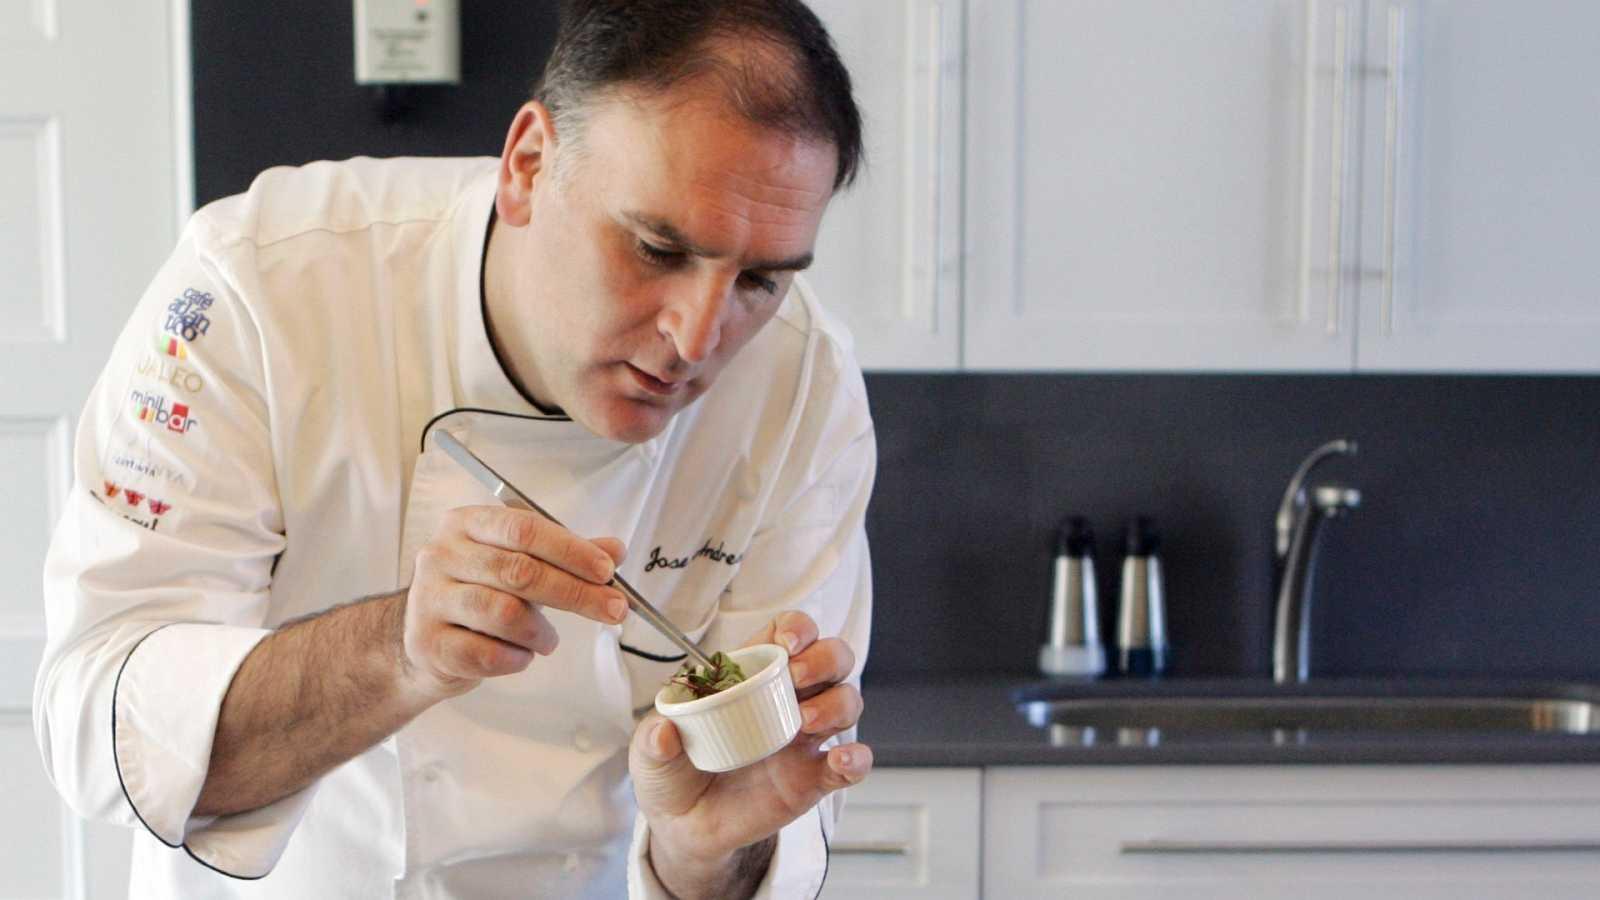 Recetas del chef José Andrés